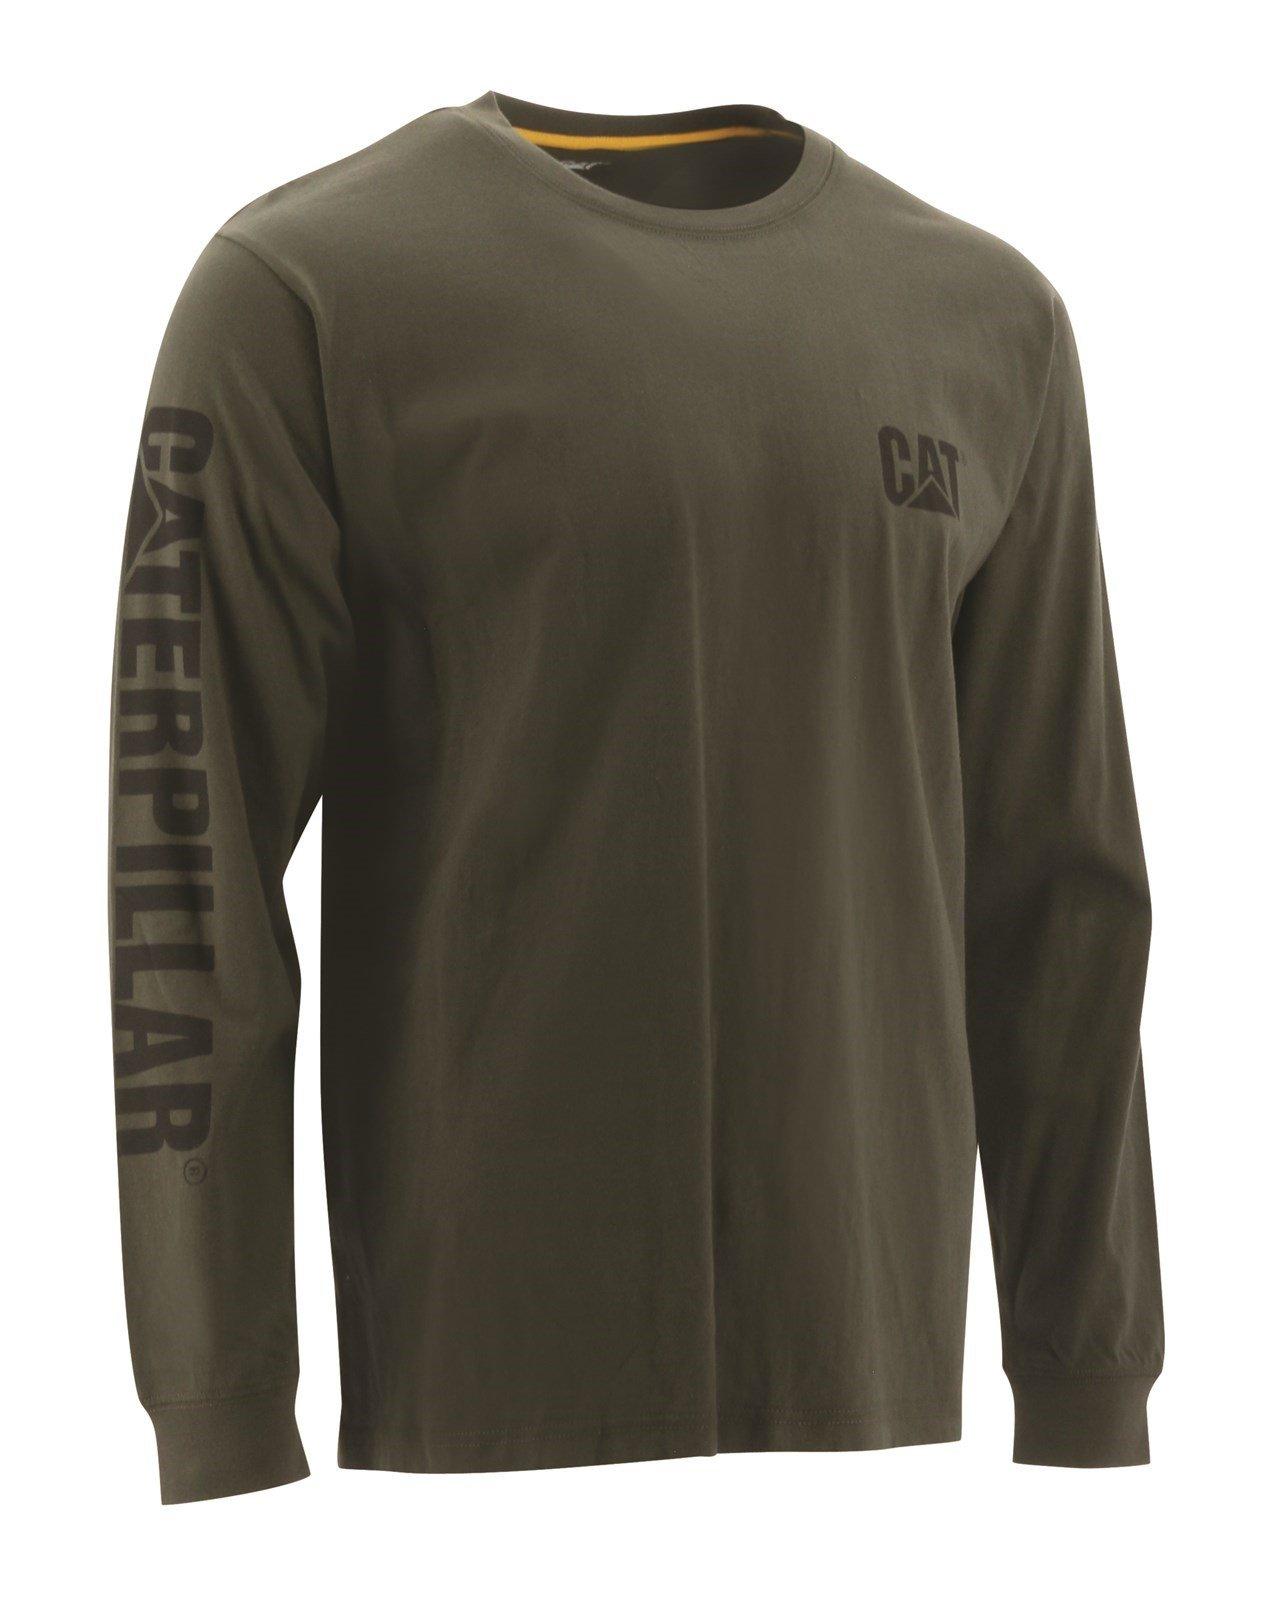 Caterpillar Unisex Trademark Banner LS T-Shirt Chive 18496 - Chive Sml